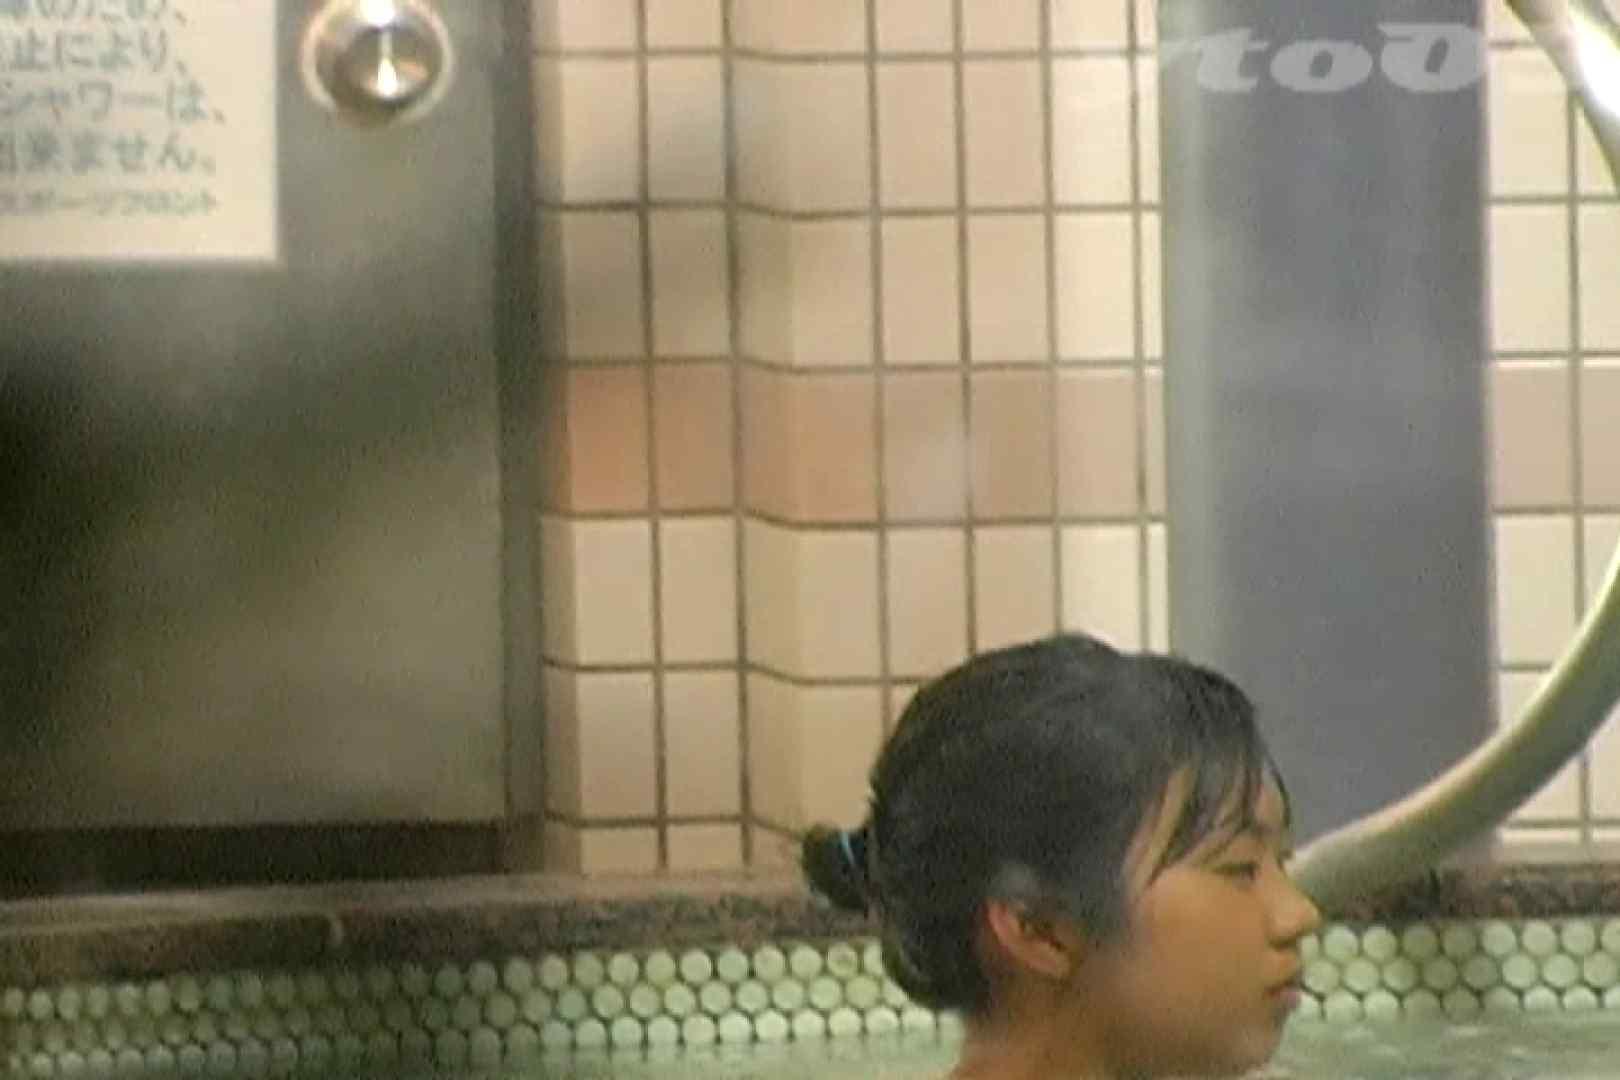 ▲復活限定▲合宿ホテル女風呂盗撮 Vol.29 ホテル SEX無修正画像 91PIX 9